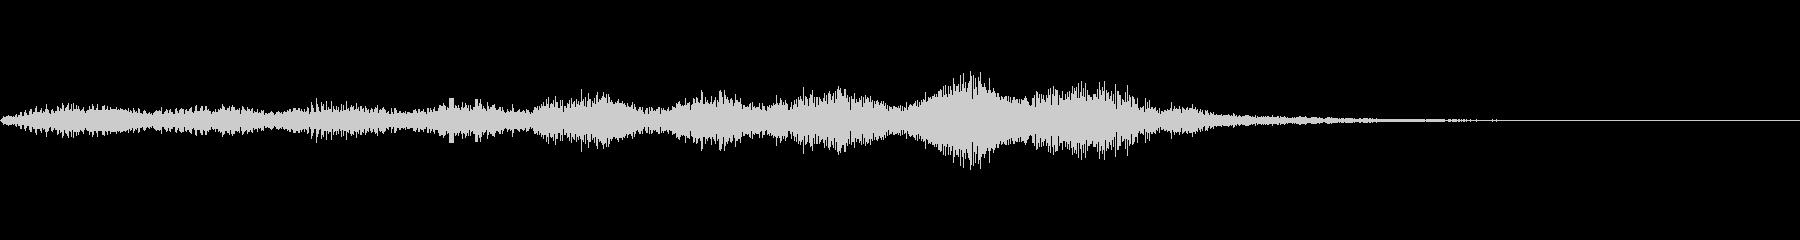 【SE 効果音】奇妙な音3の未再生の波形